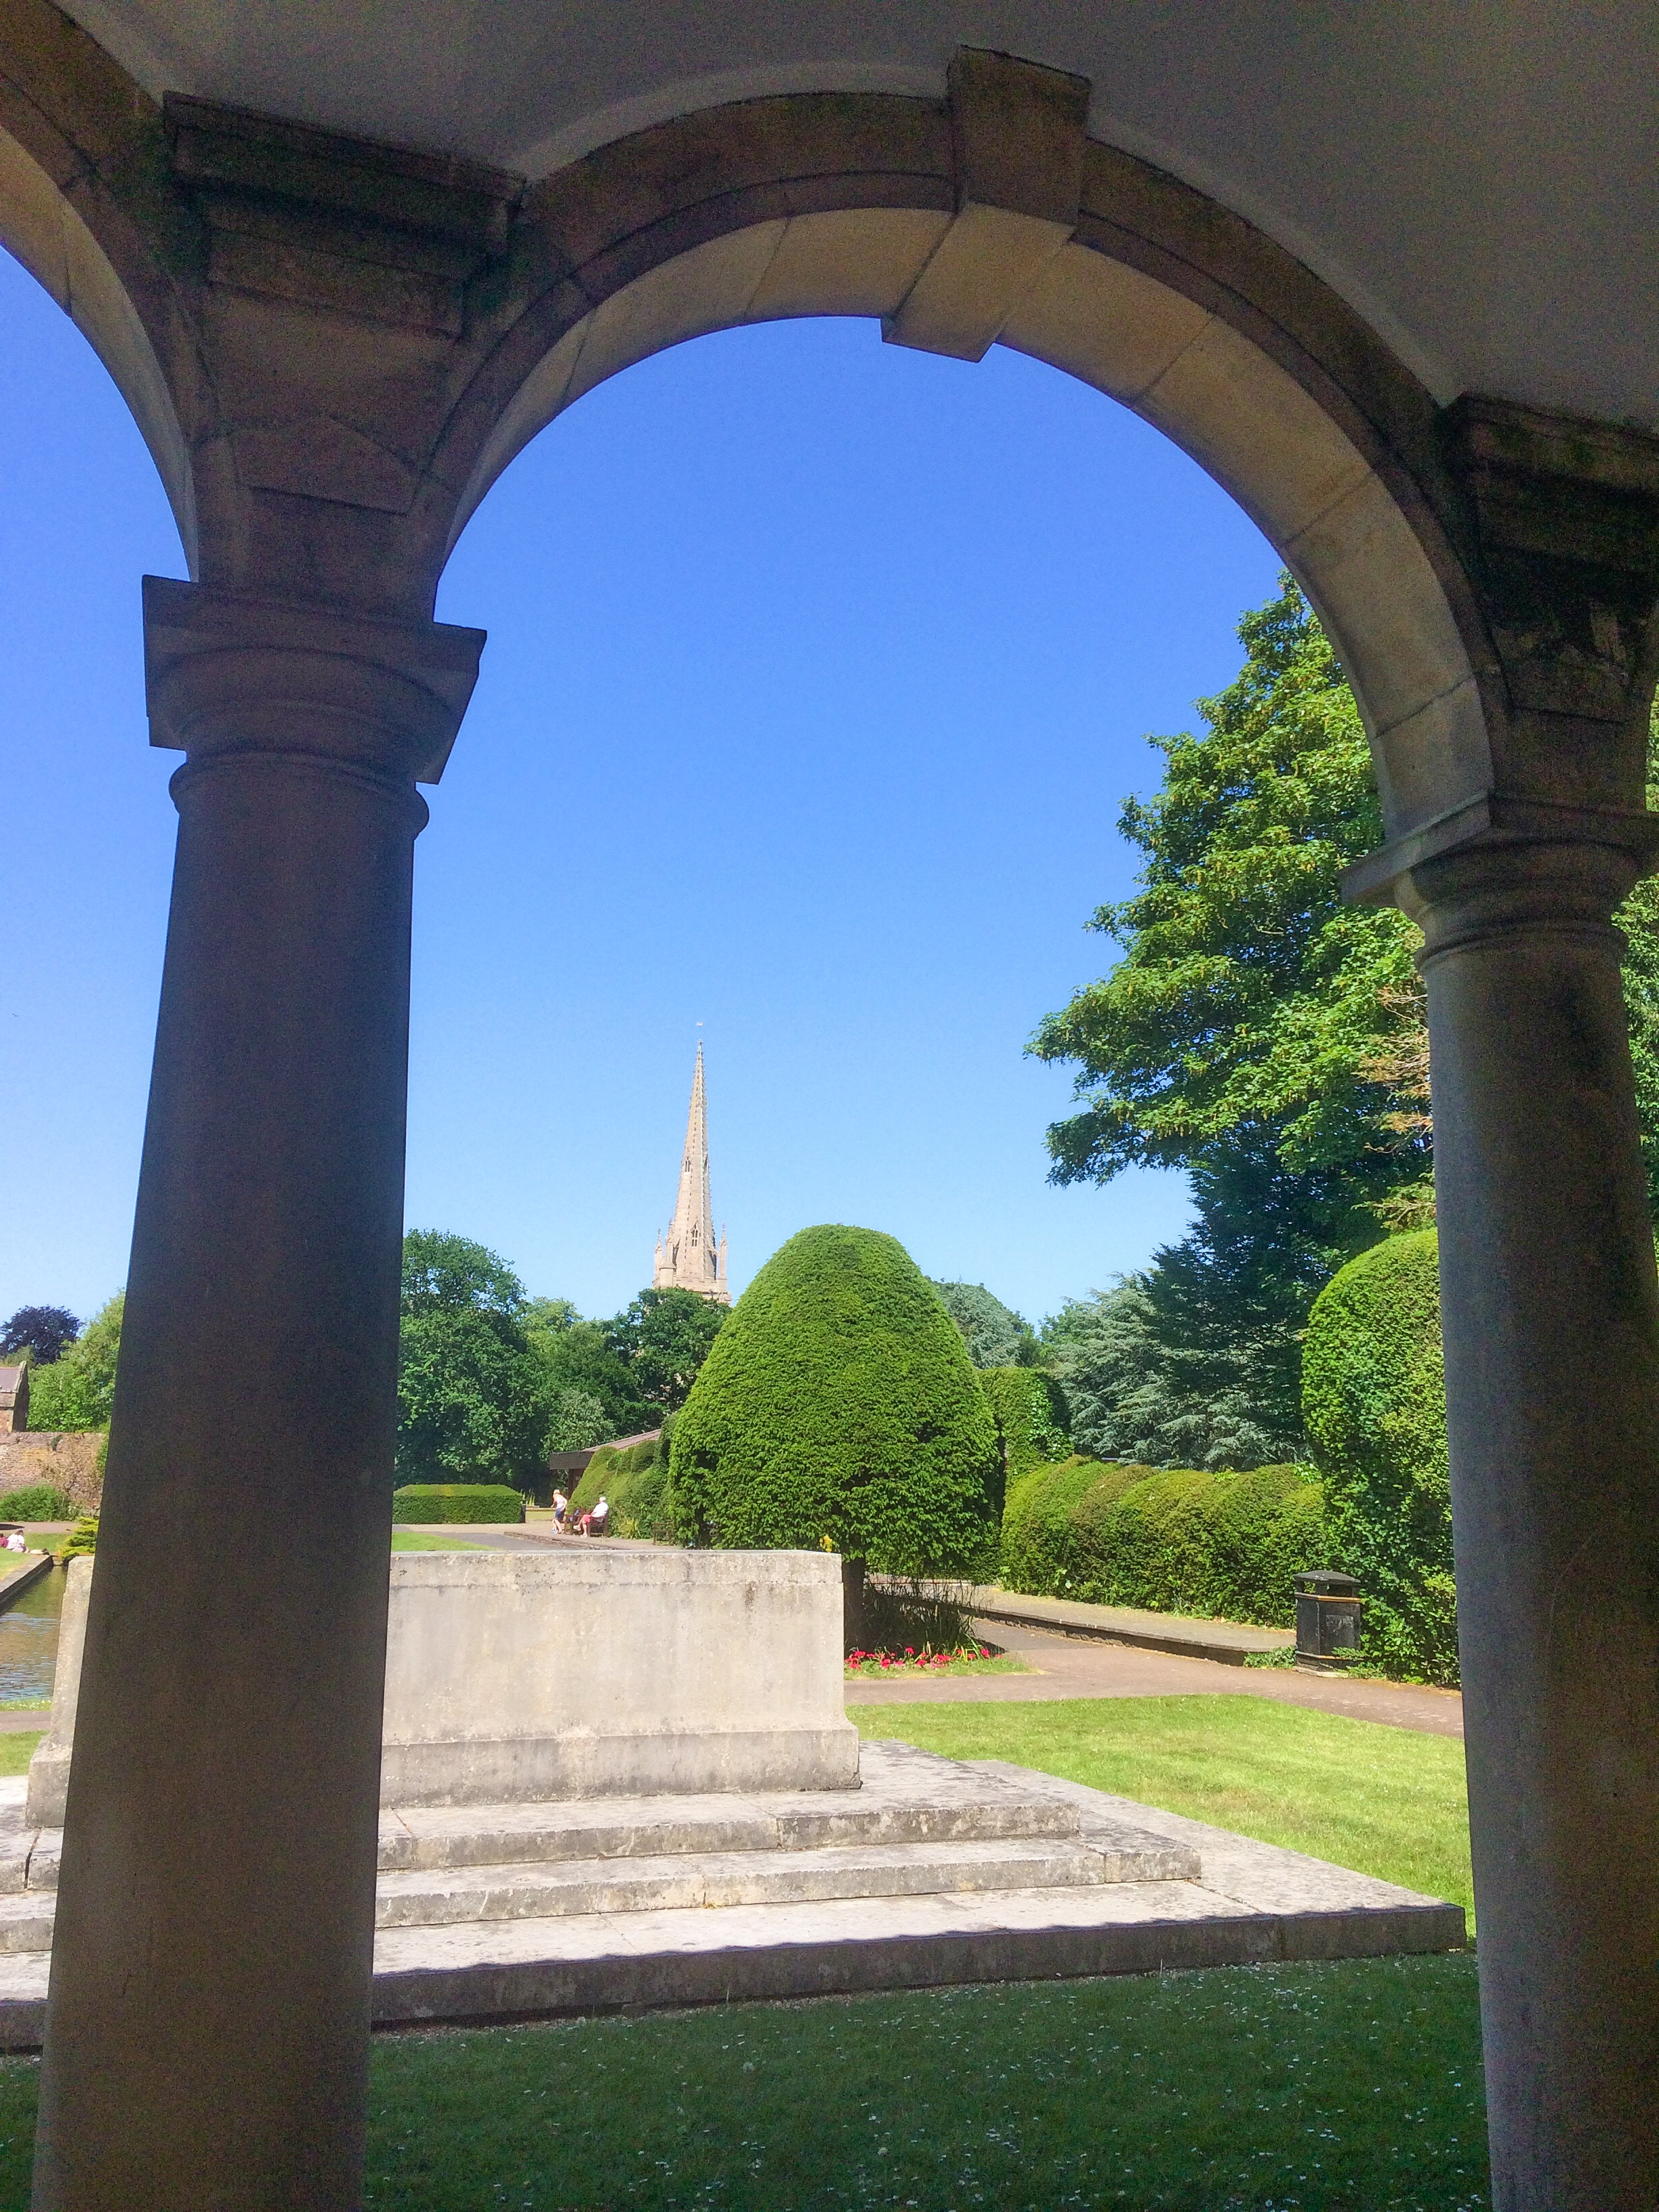 gardens-lincolnshire-memorial-war-memorial-4507142